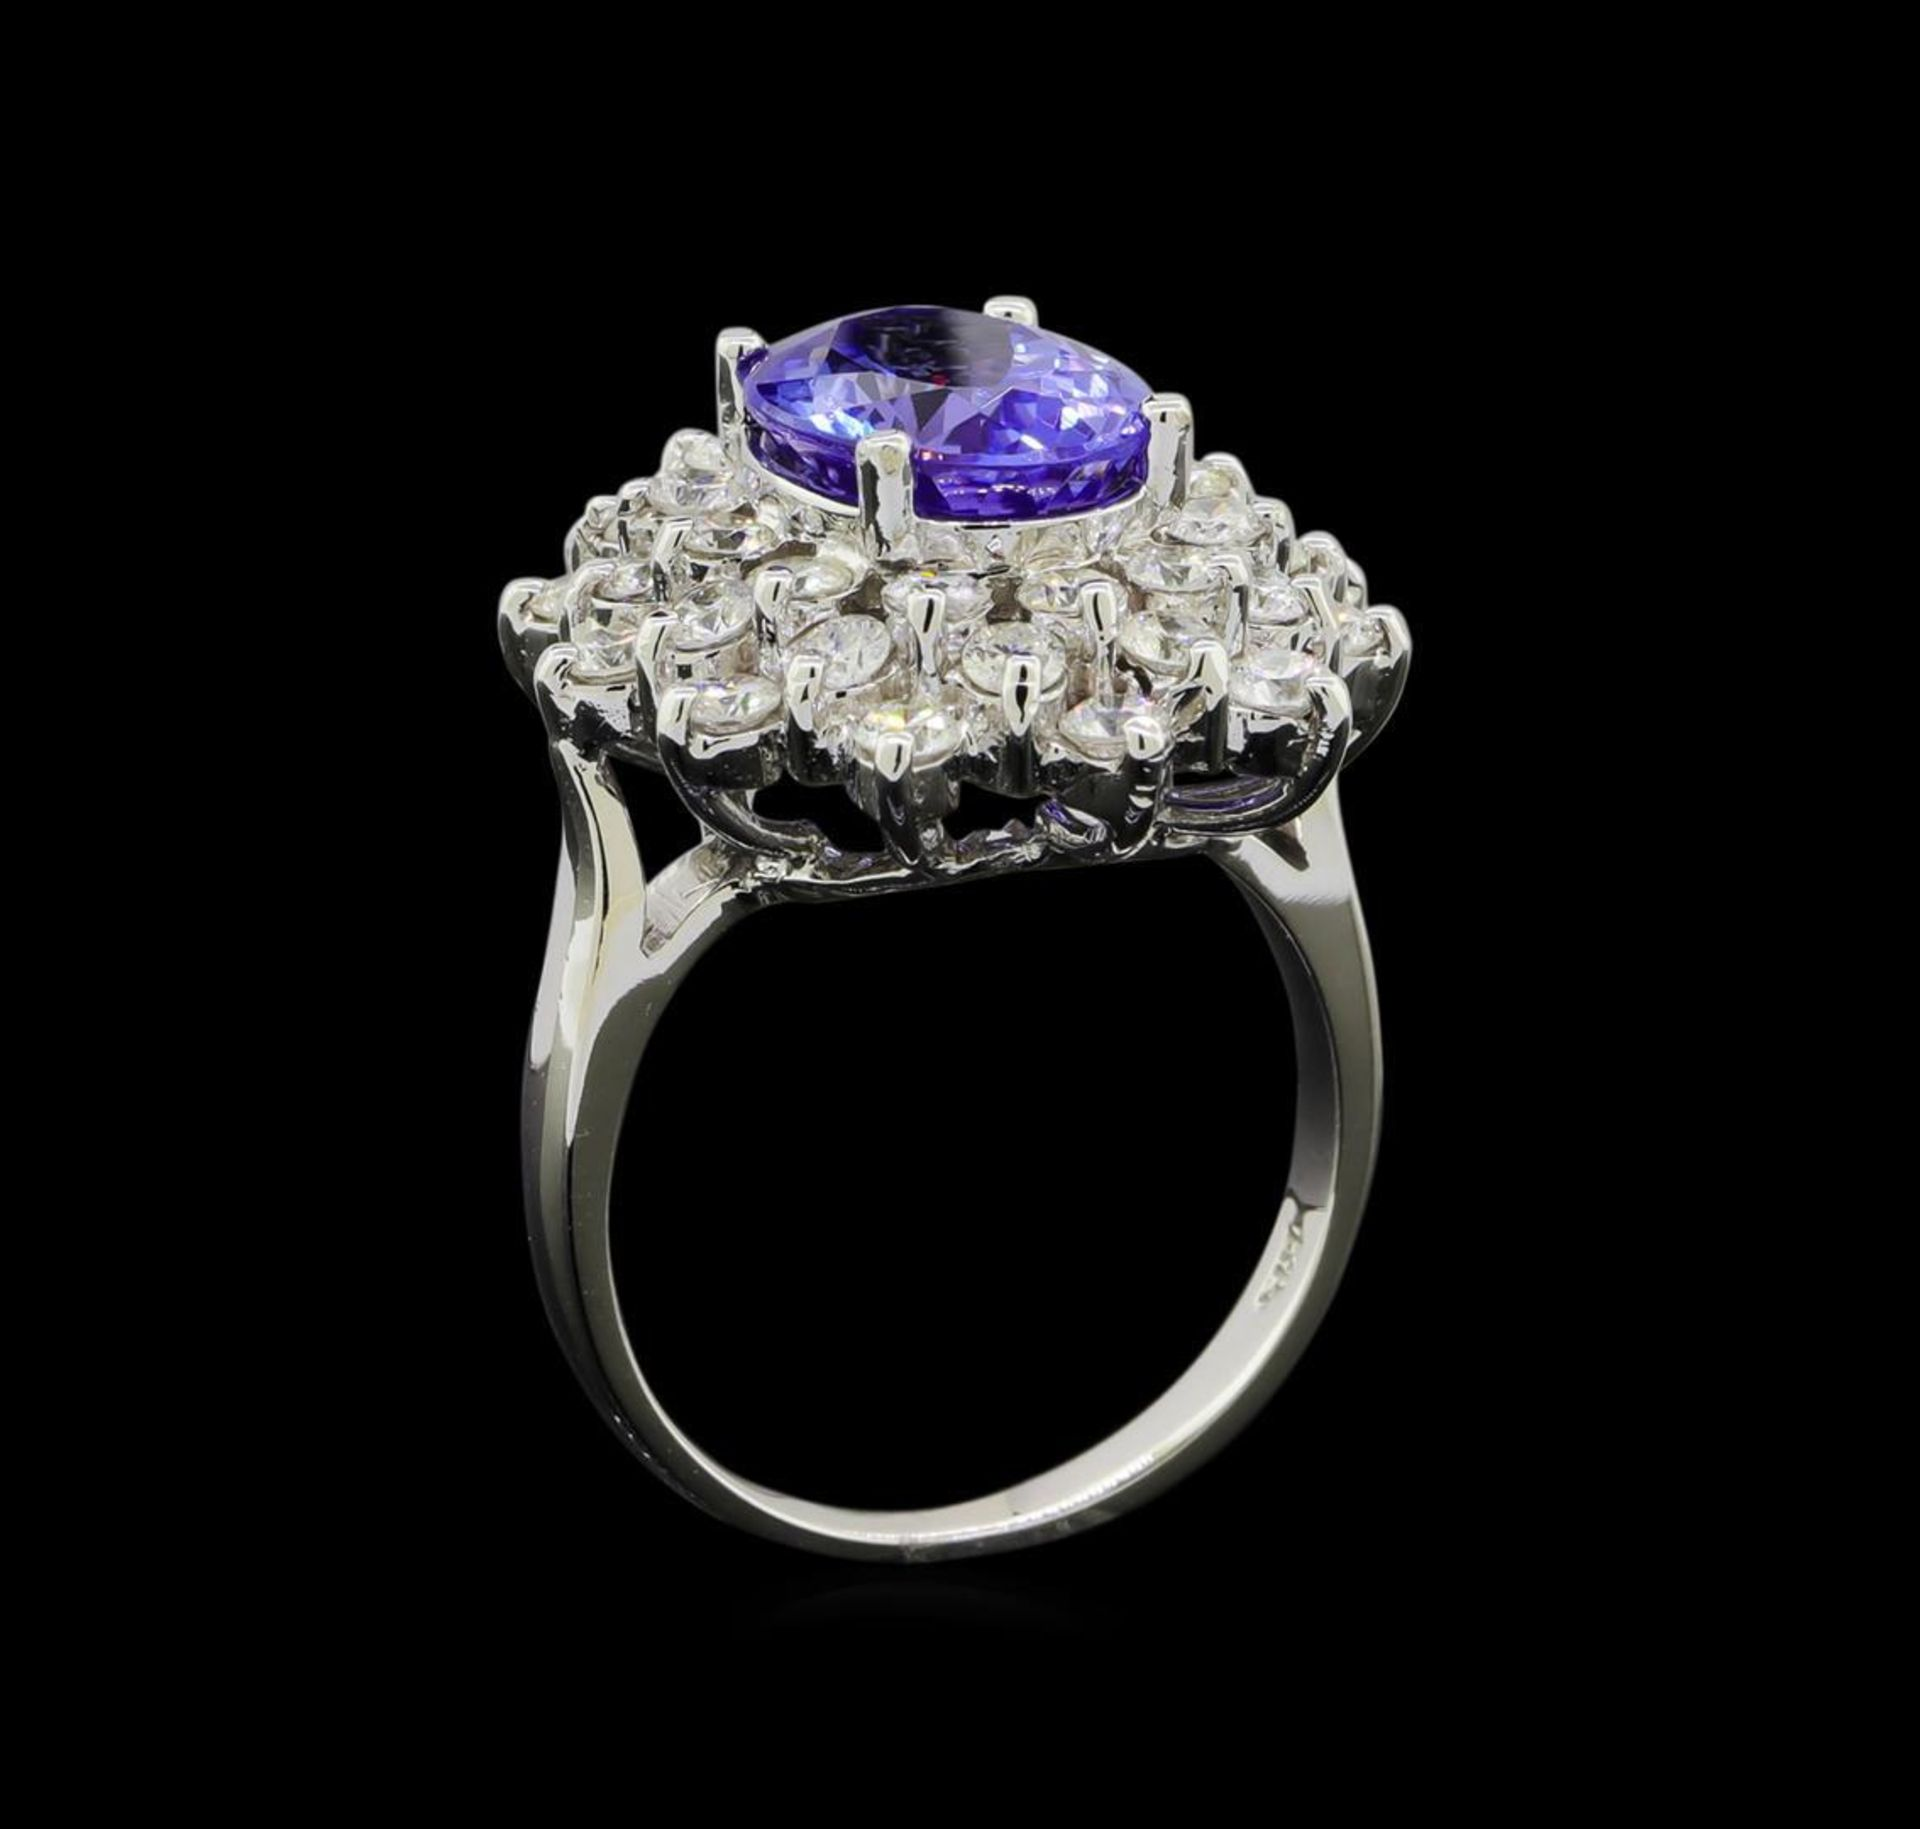 3.90 ctw Tanzanite and Diamond Ring - 14KT White Gold - Image 4 of 5